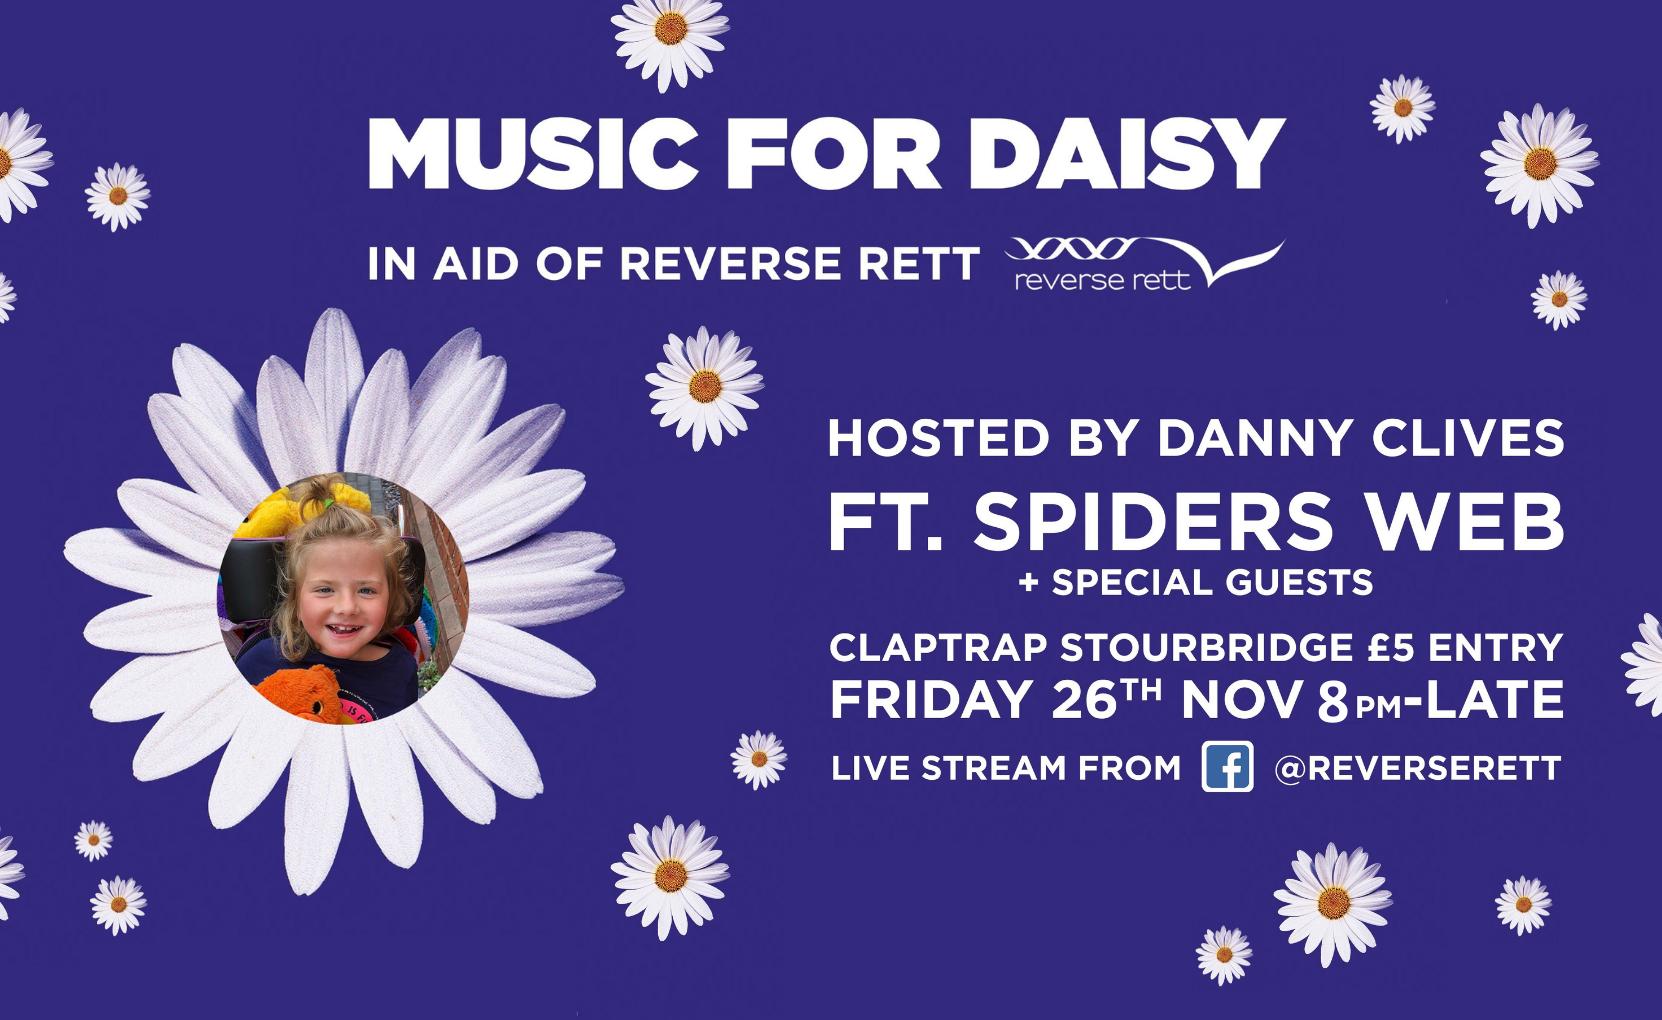 Music For Daisy Friday 26th November